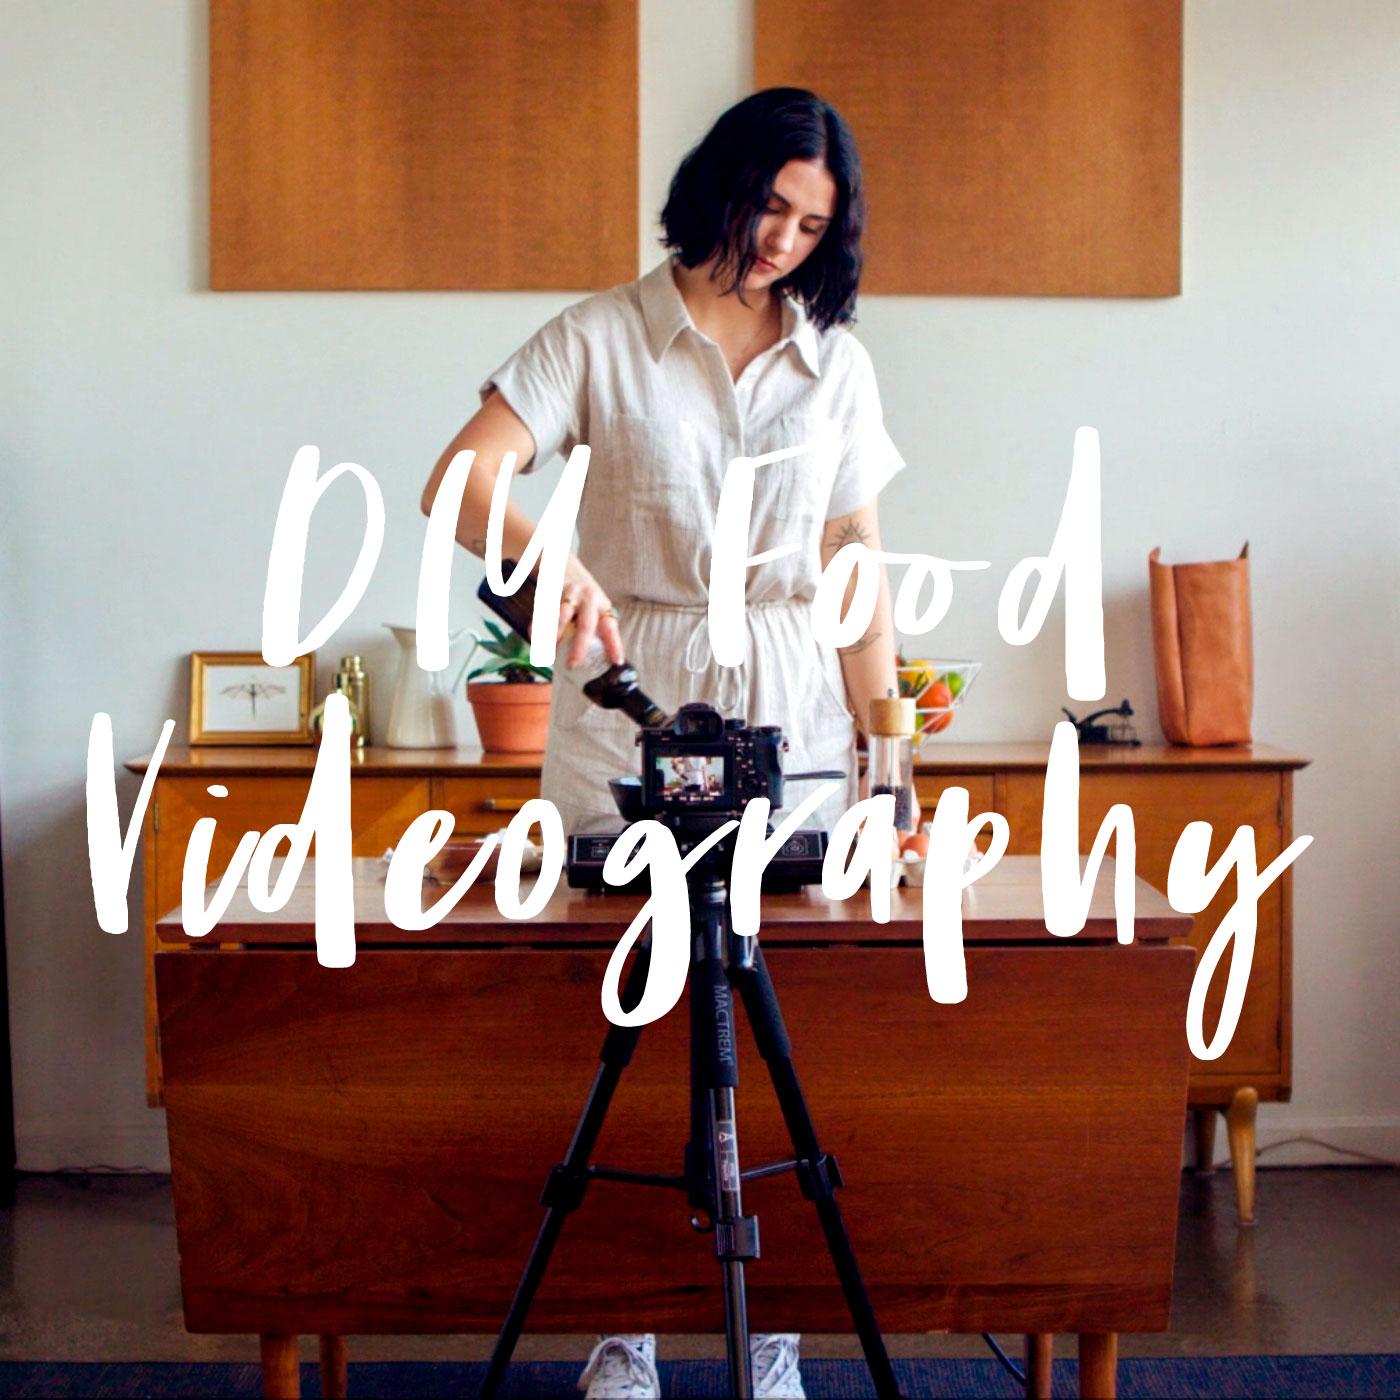 videography-thumbnail.jpg